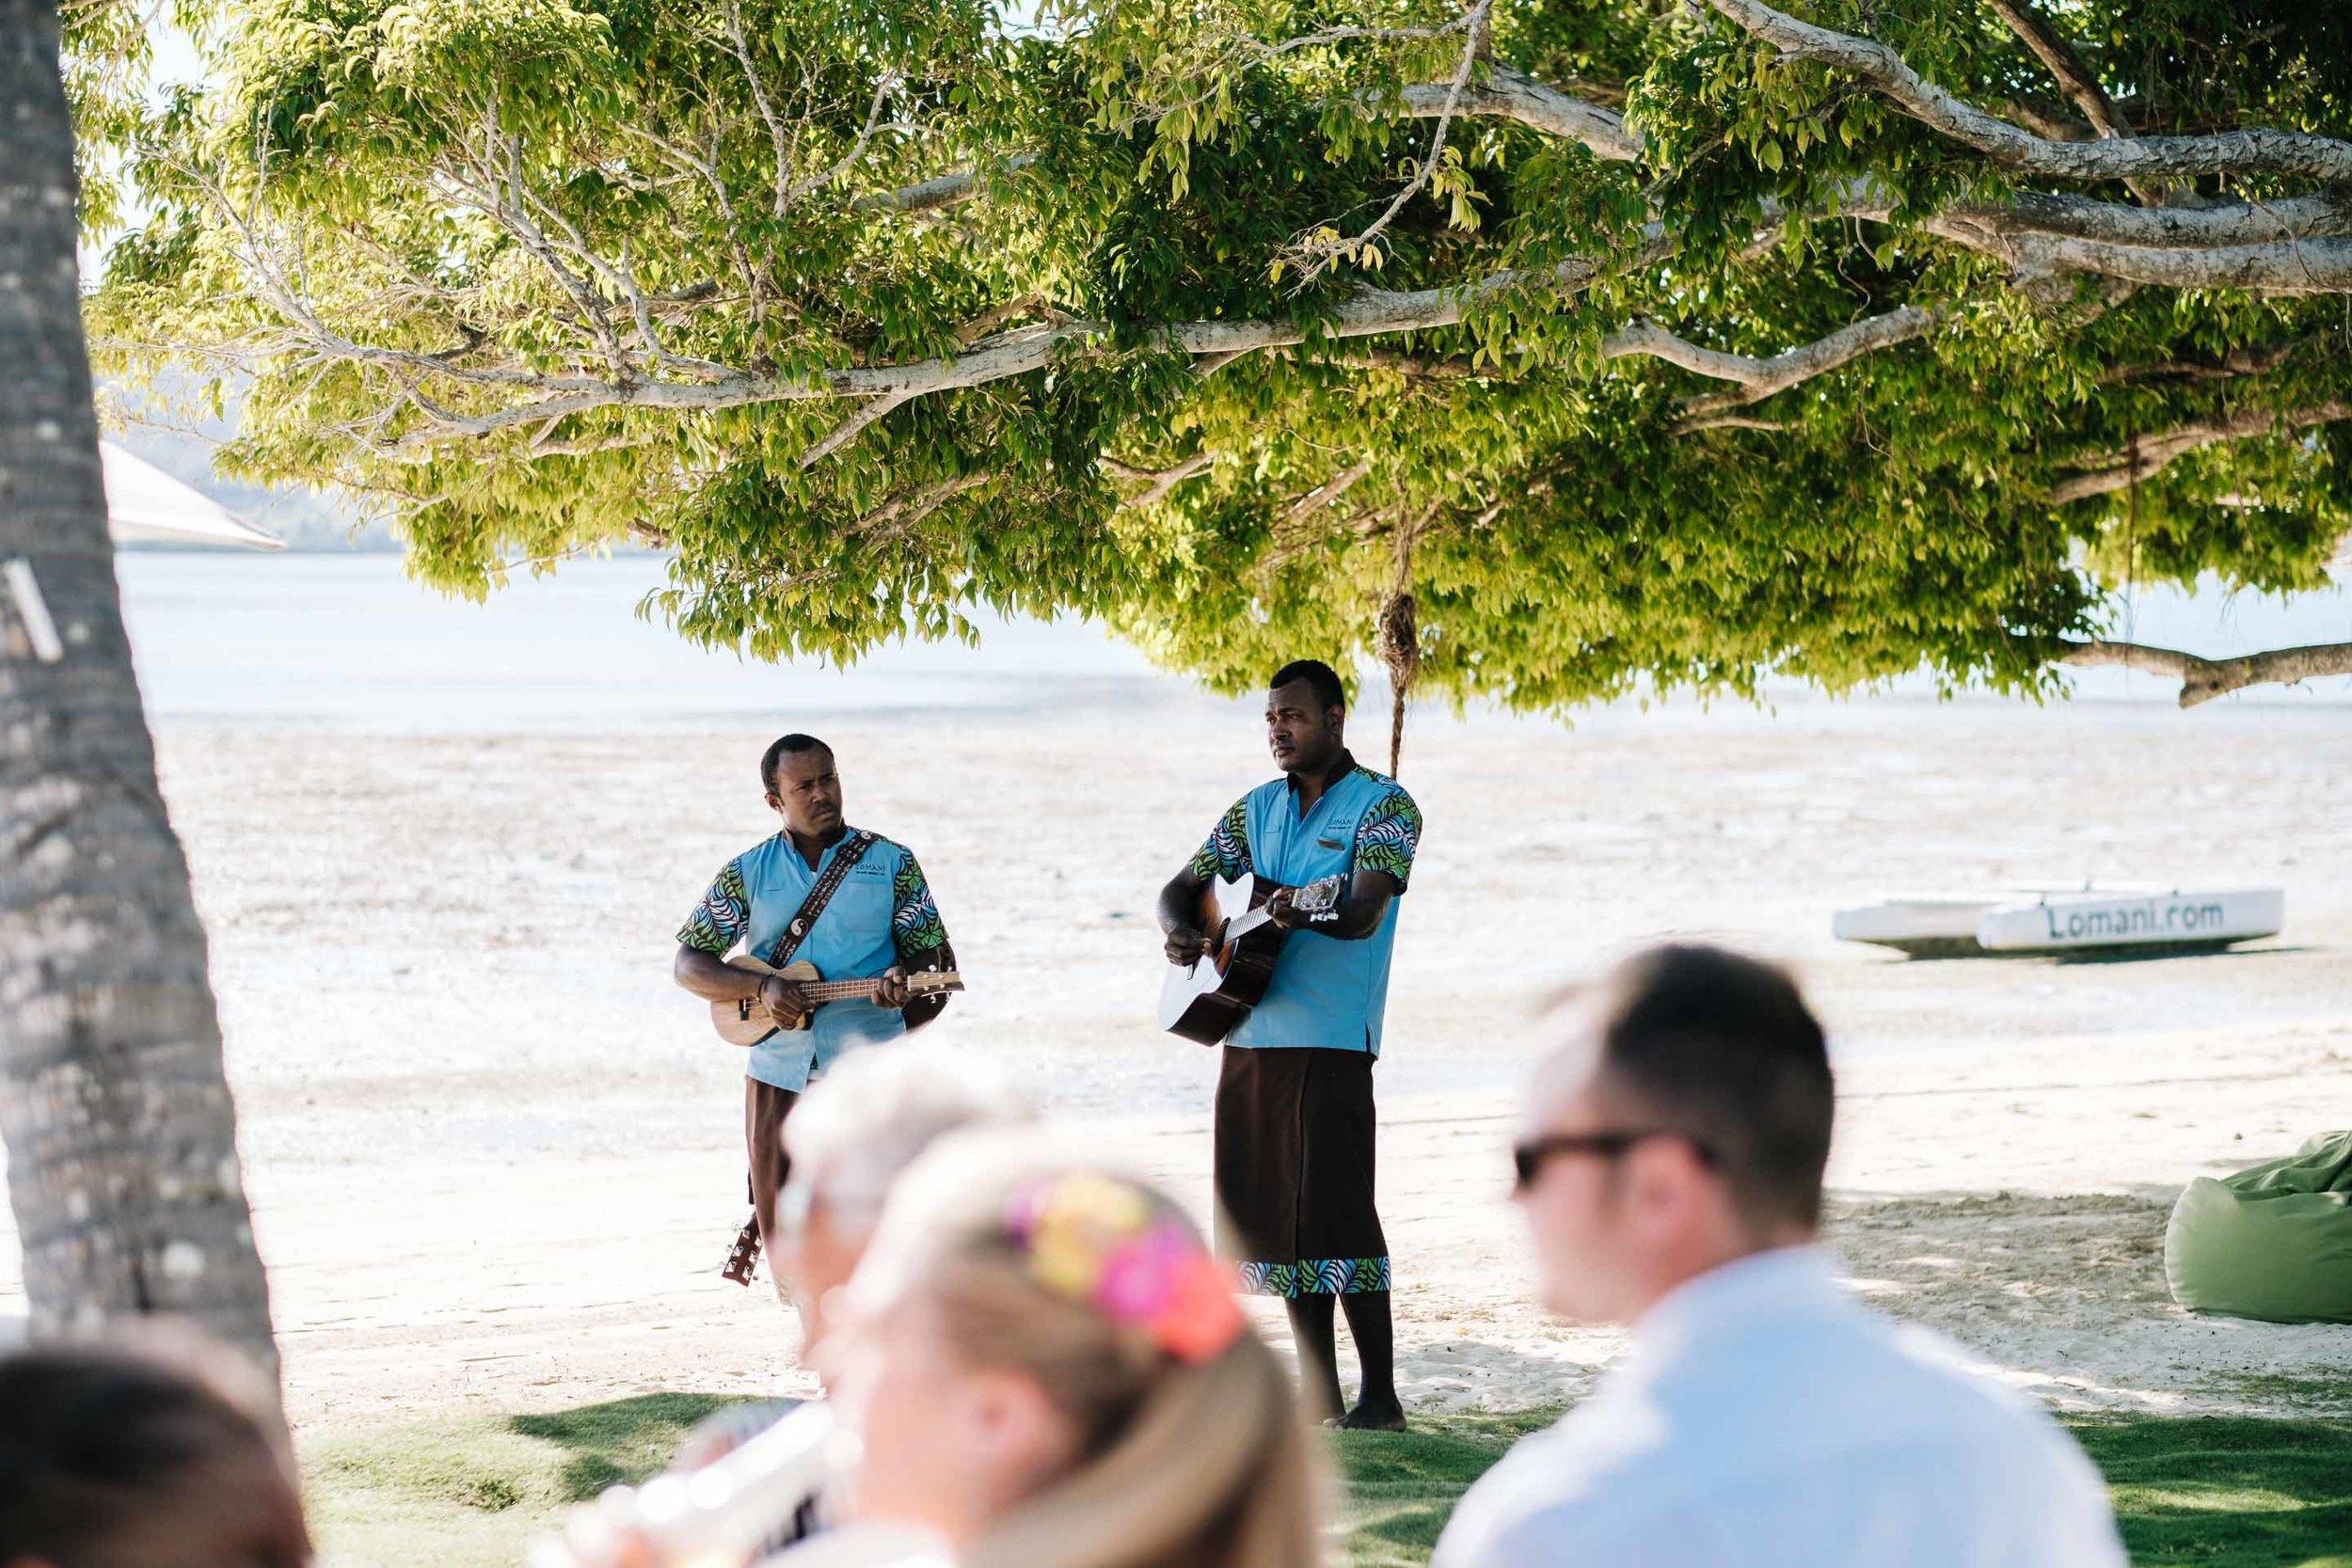 Serenaders under a tree strumming entertaining guests